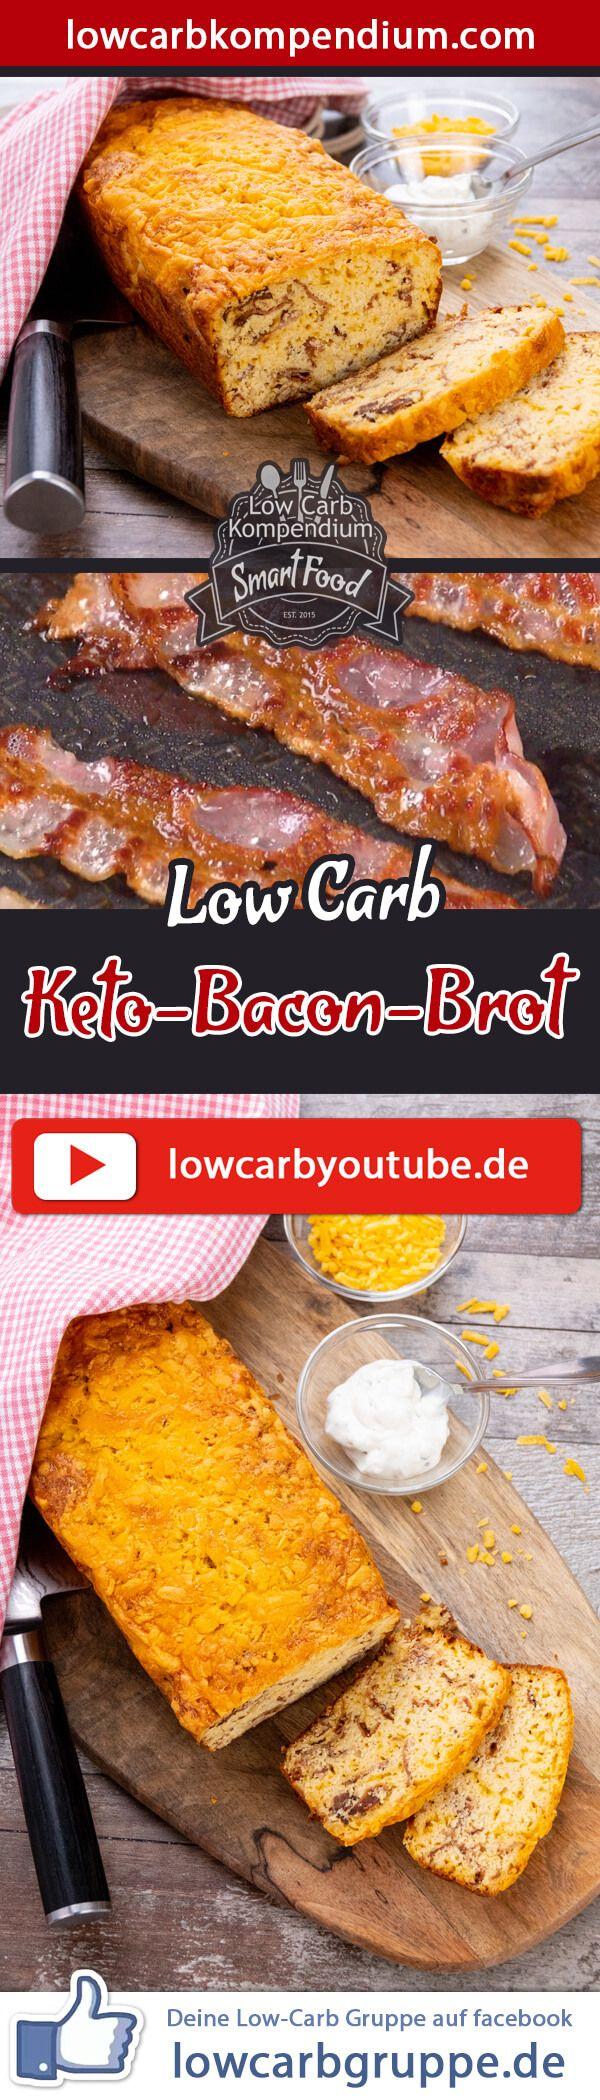 Keto-Bacon-Brot �� � Das würzige Keto & Low-Carb Brot Rezept